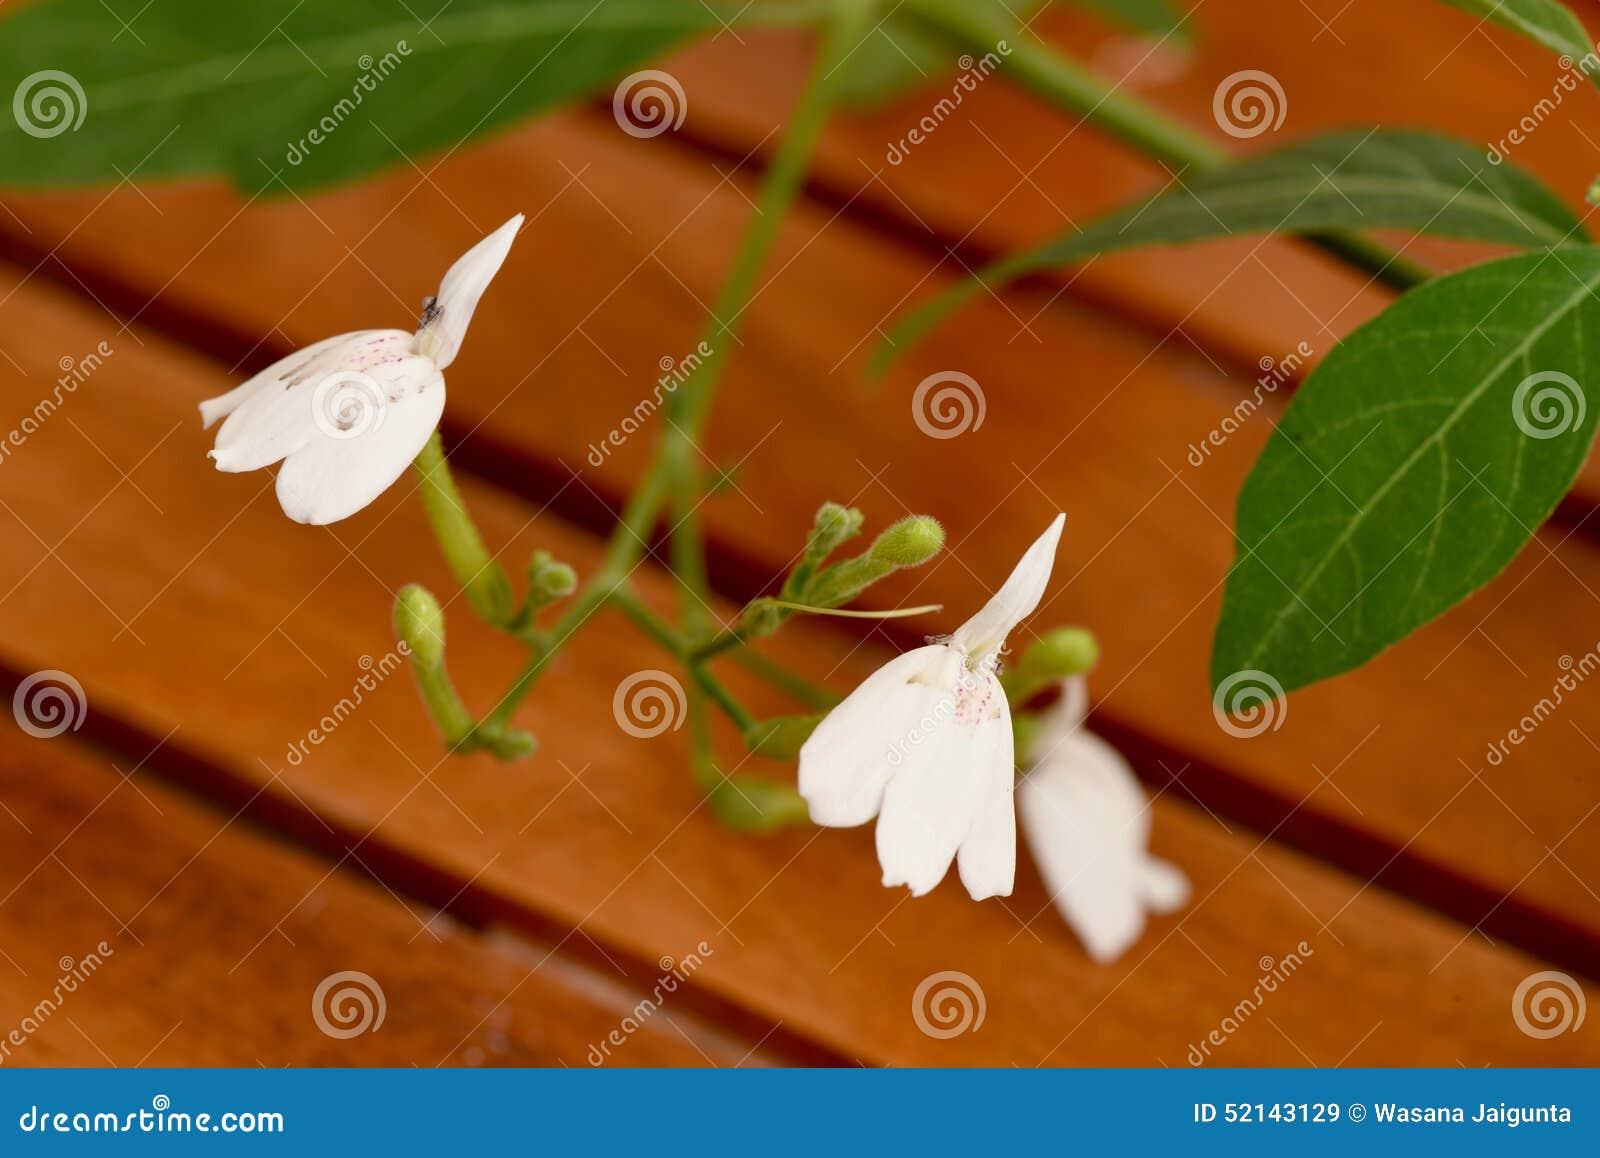 White Crane Flower Fresh And Dried Leaves Rhinacanthus Nasutus